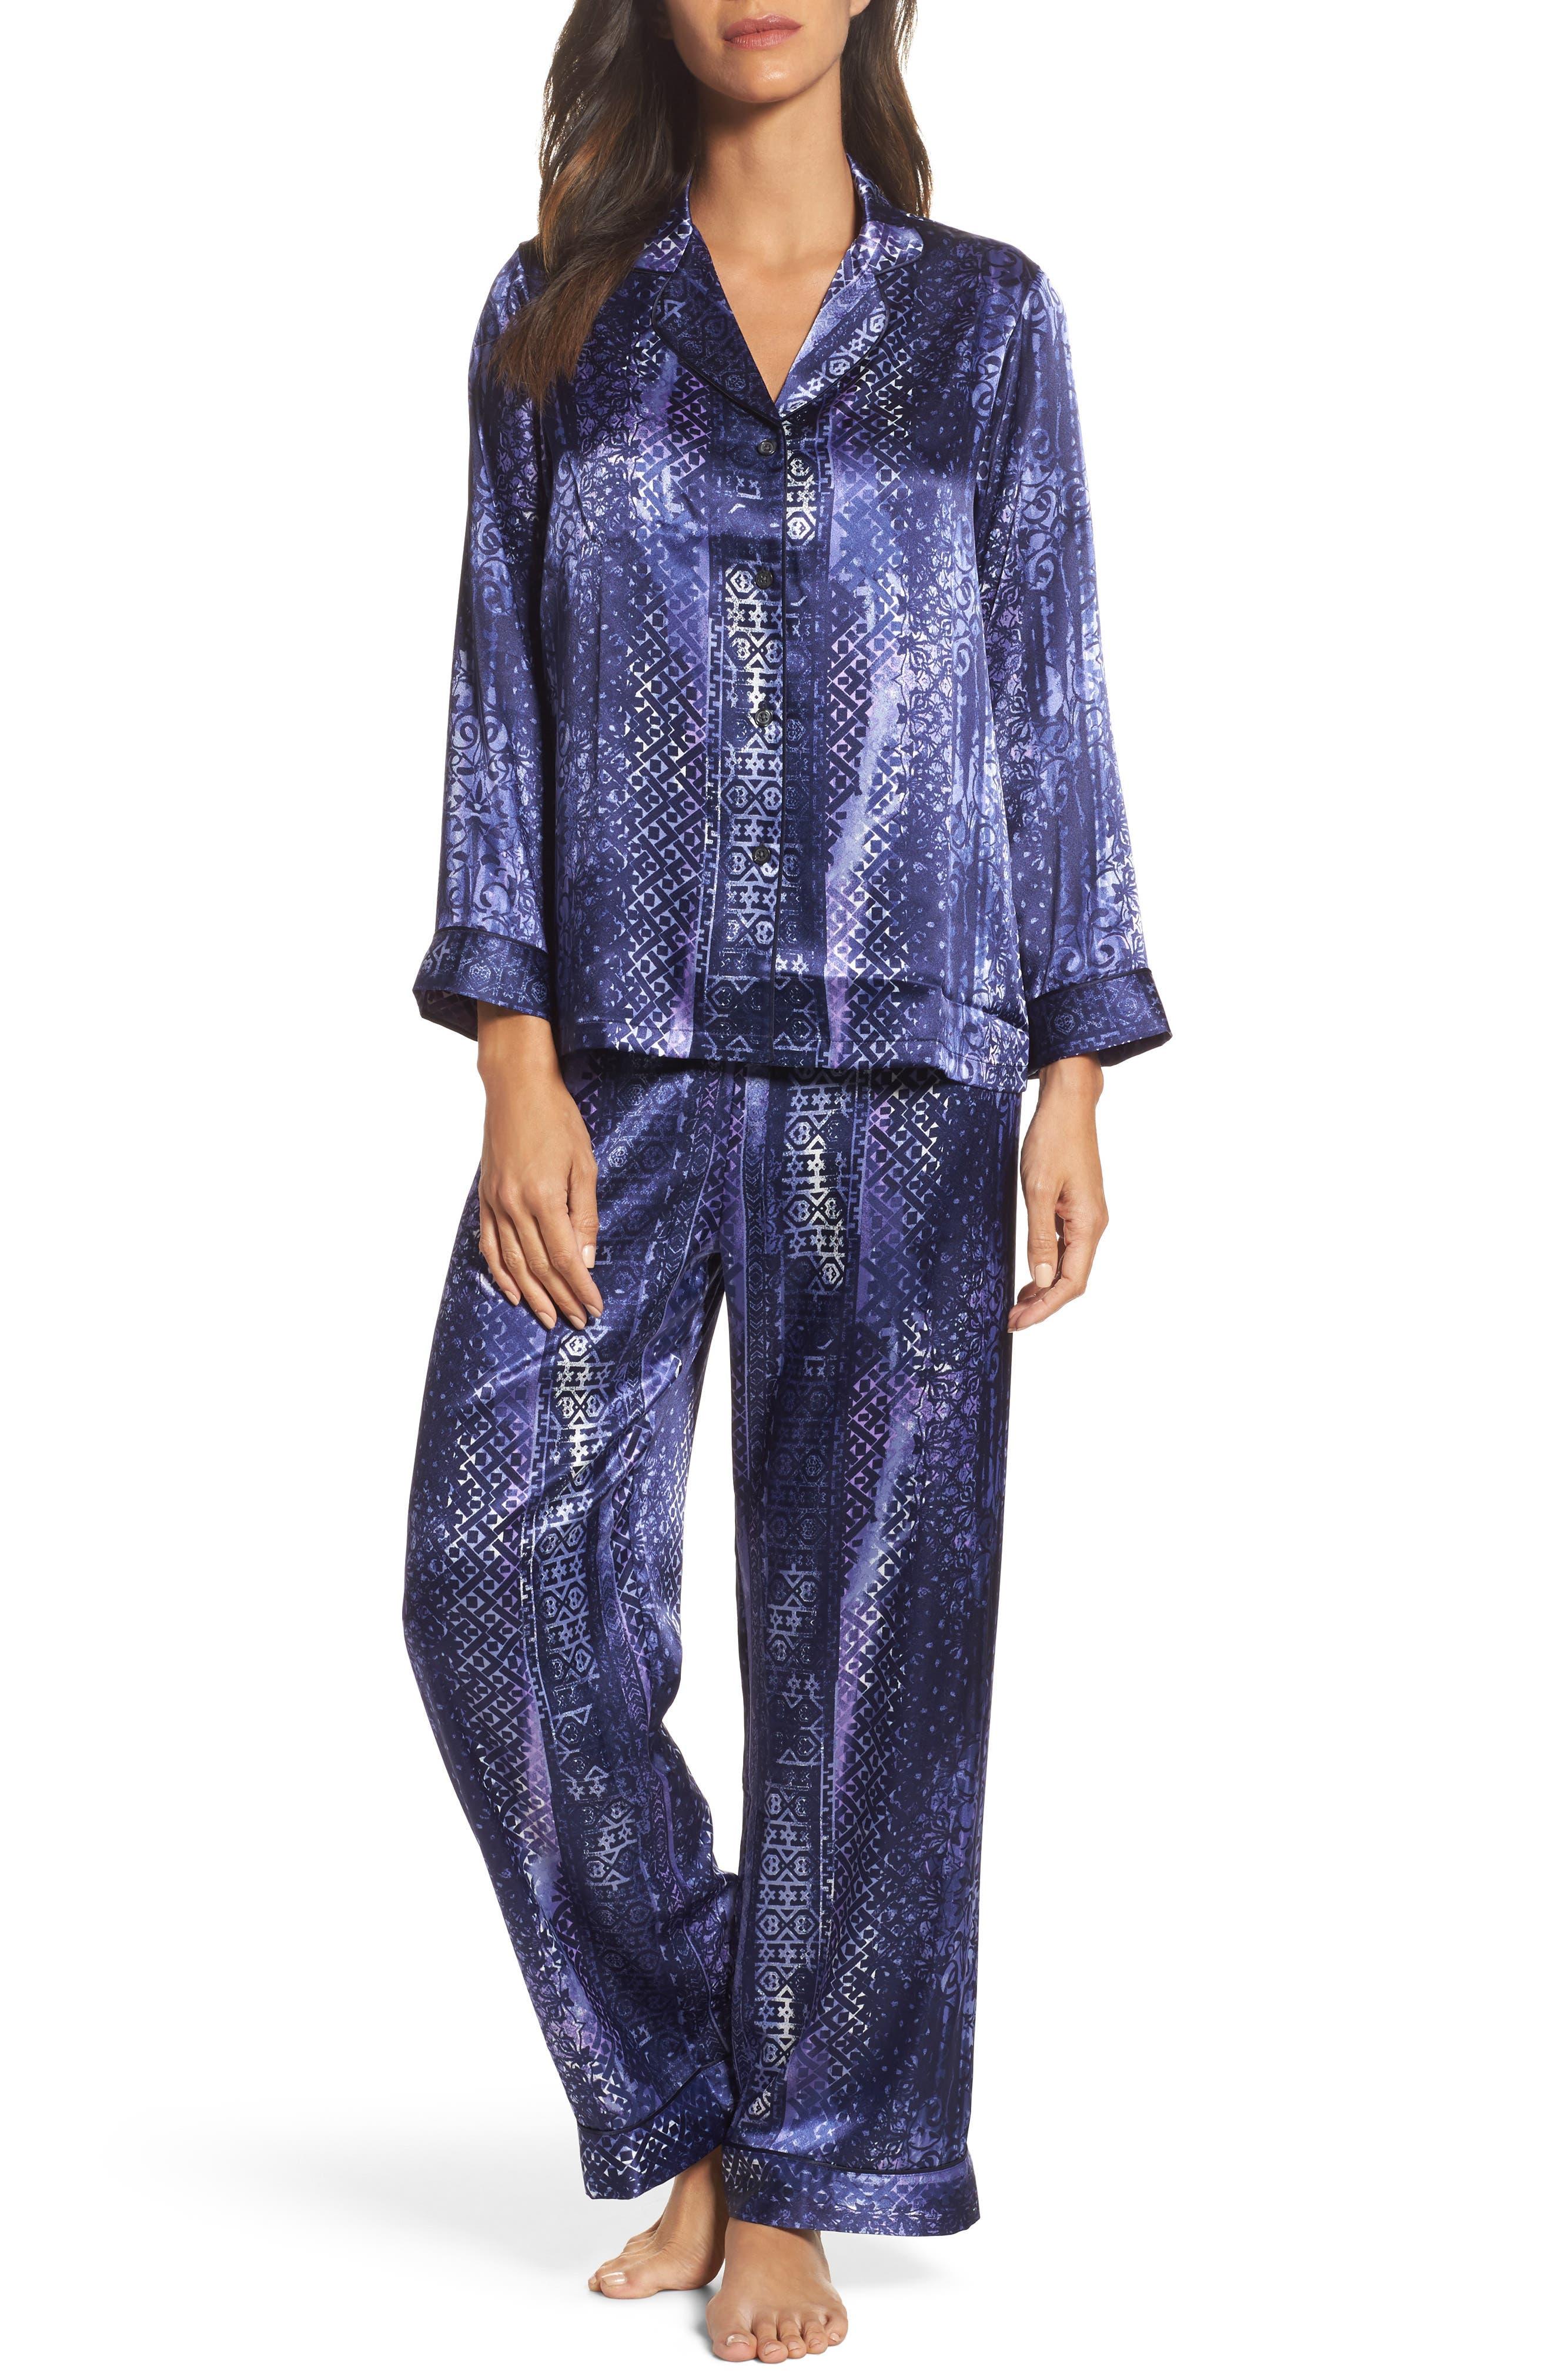 Main Image - Oscar de la Renta Sleepwear Charmeuse Pajamas